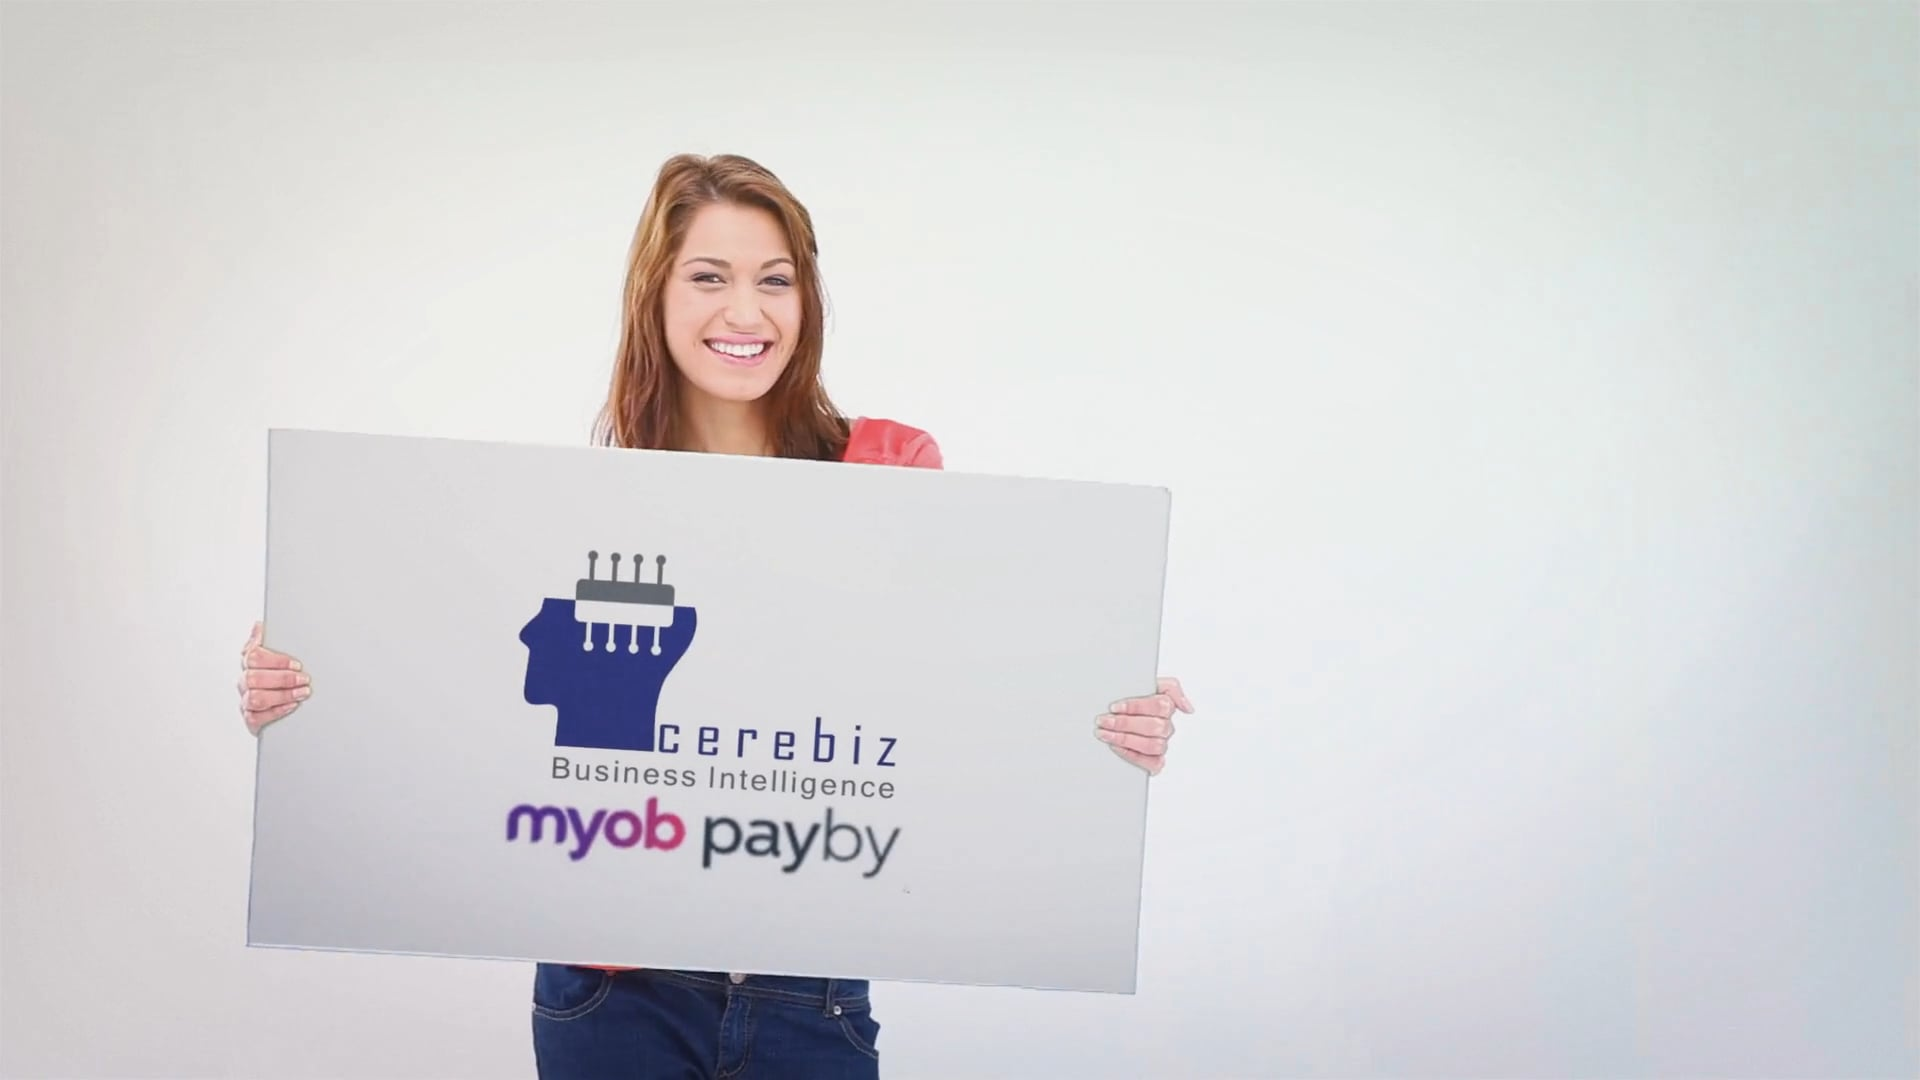 Cerebiz and MYOB PayBy